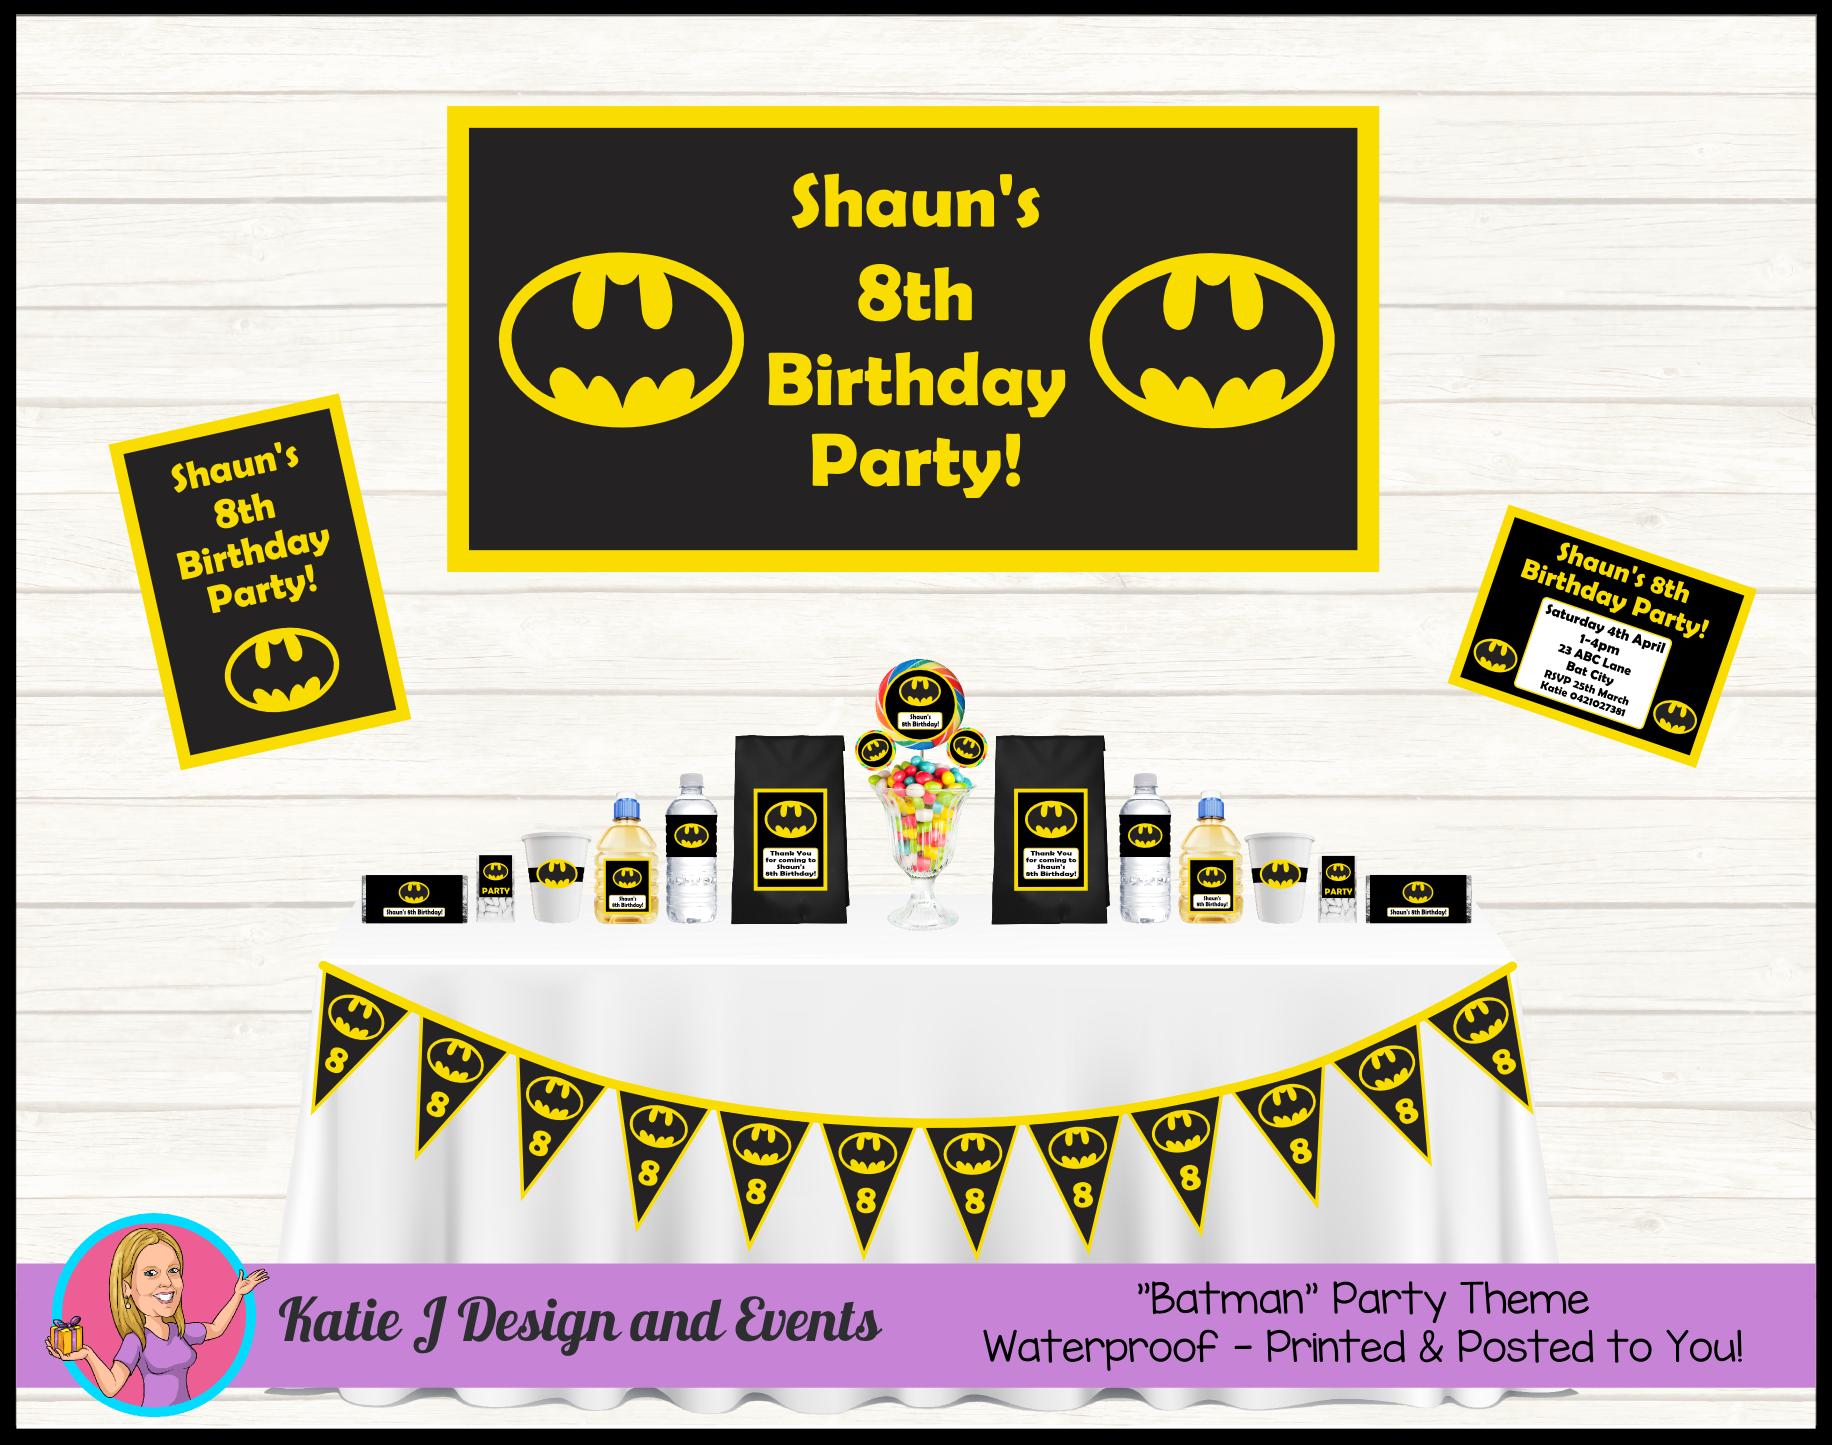 Batman Logo Personalised Birthday Party Decorations Supplies Packs Shop Online Australia Banners Bunting Wall Display Cupcake